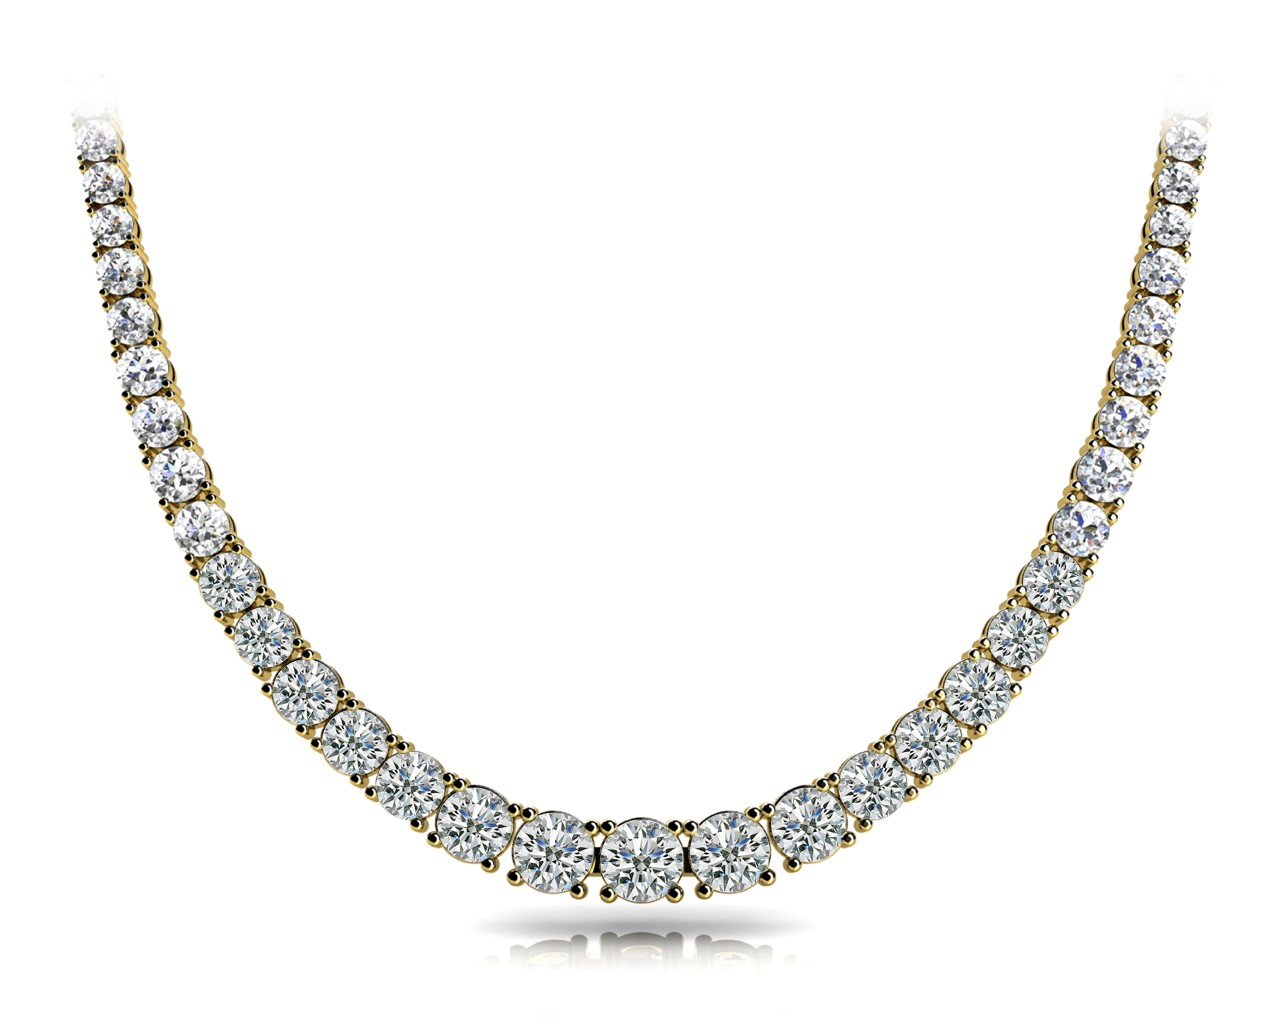 14k-yellow-gold-eternity-diamond-necklace-60019-20